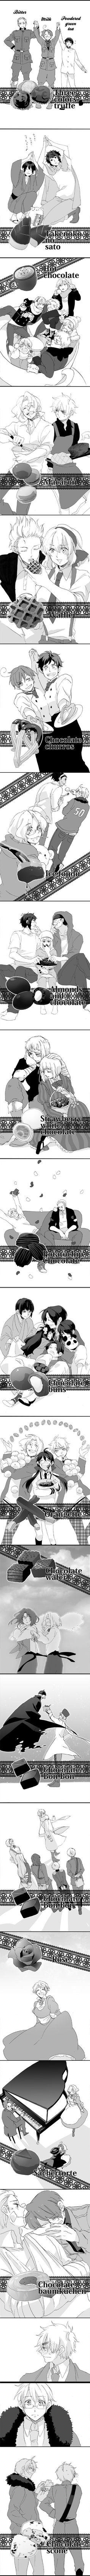 Bueno, ignoremos el ultimo chocolate, osea, POTATOCHIPS CHOCOLATE, I NEED